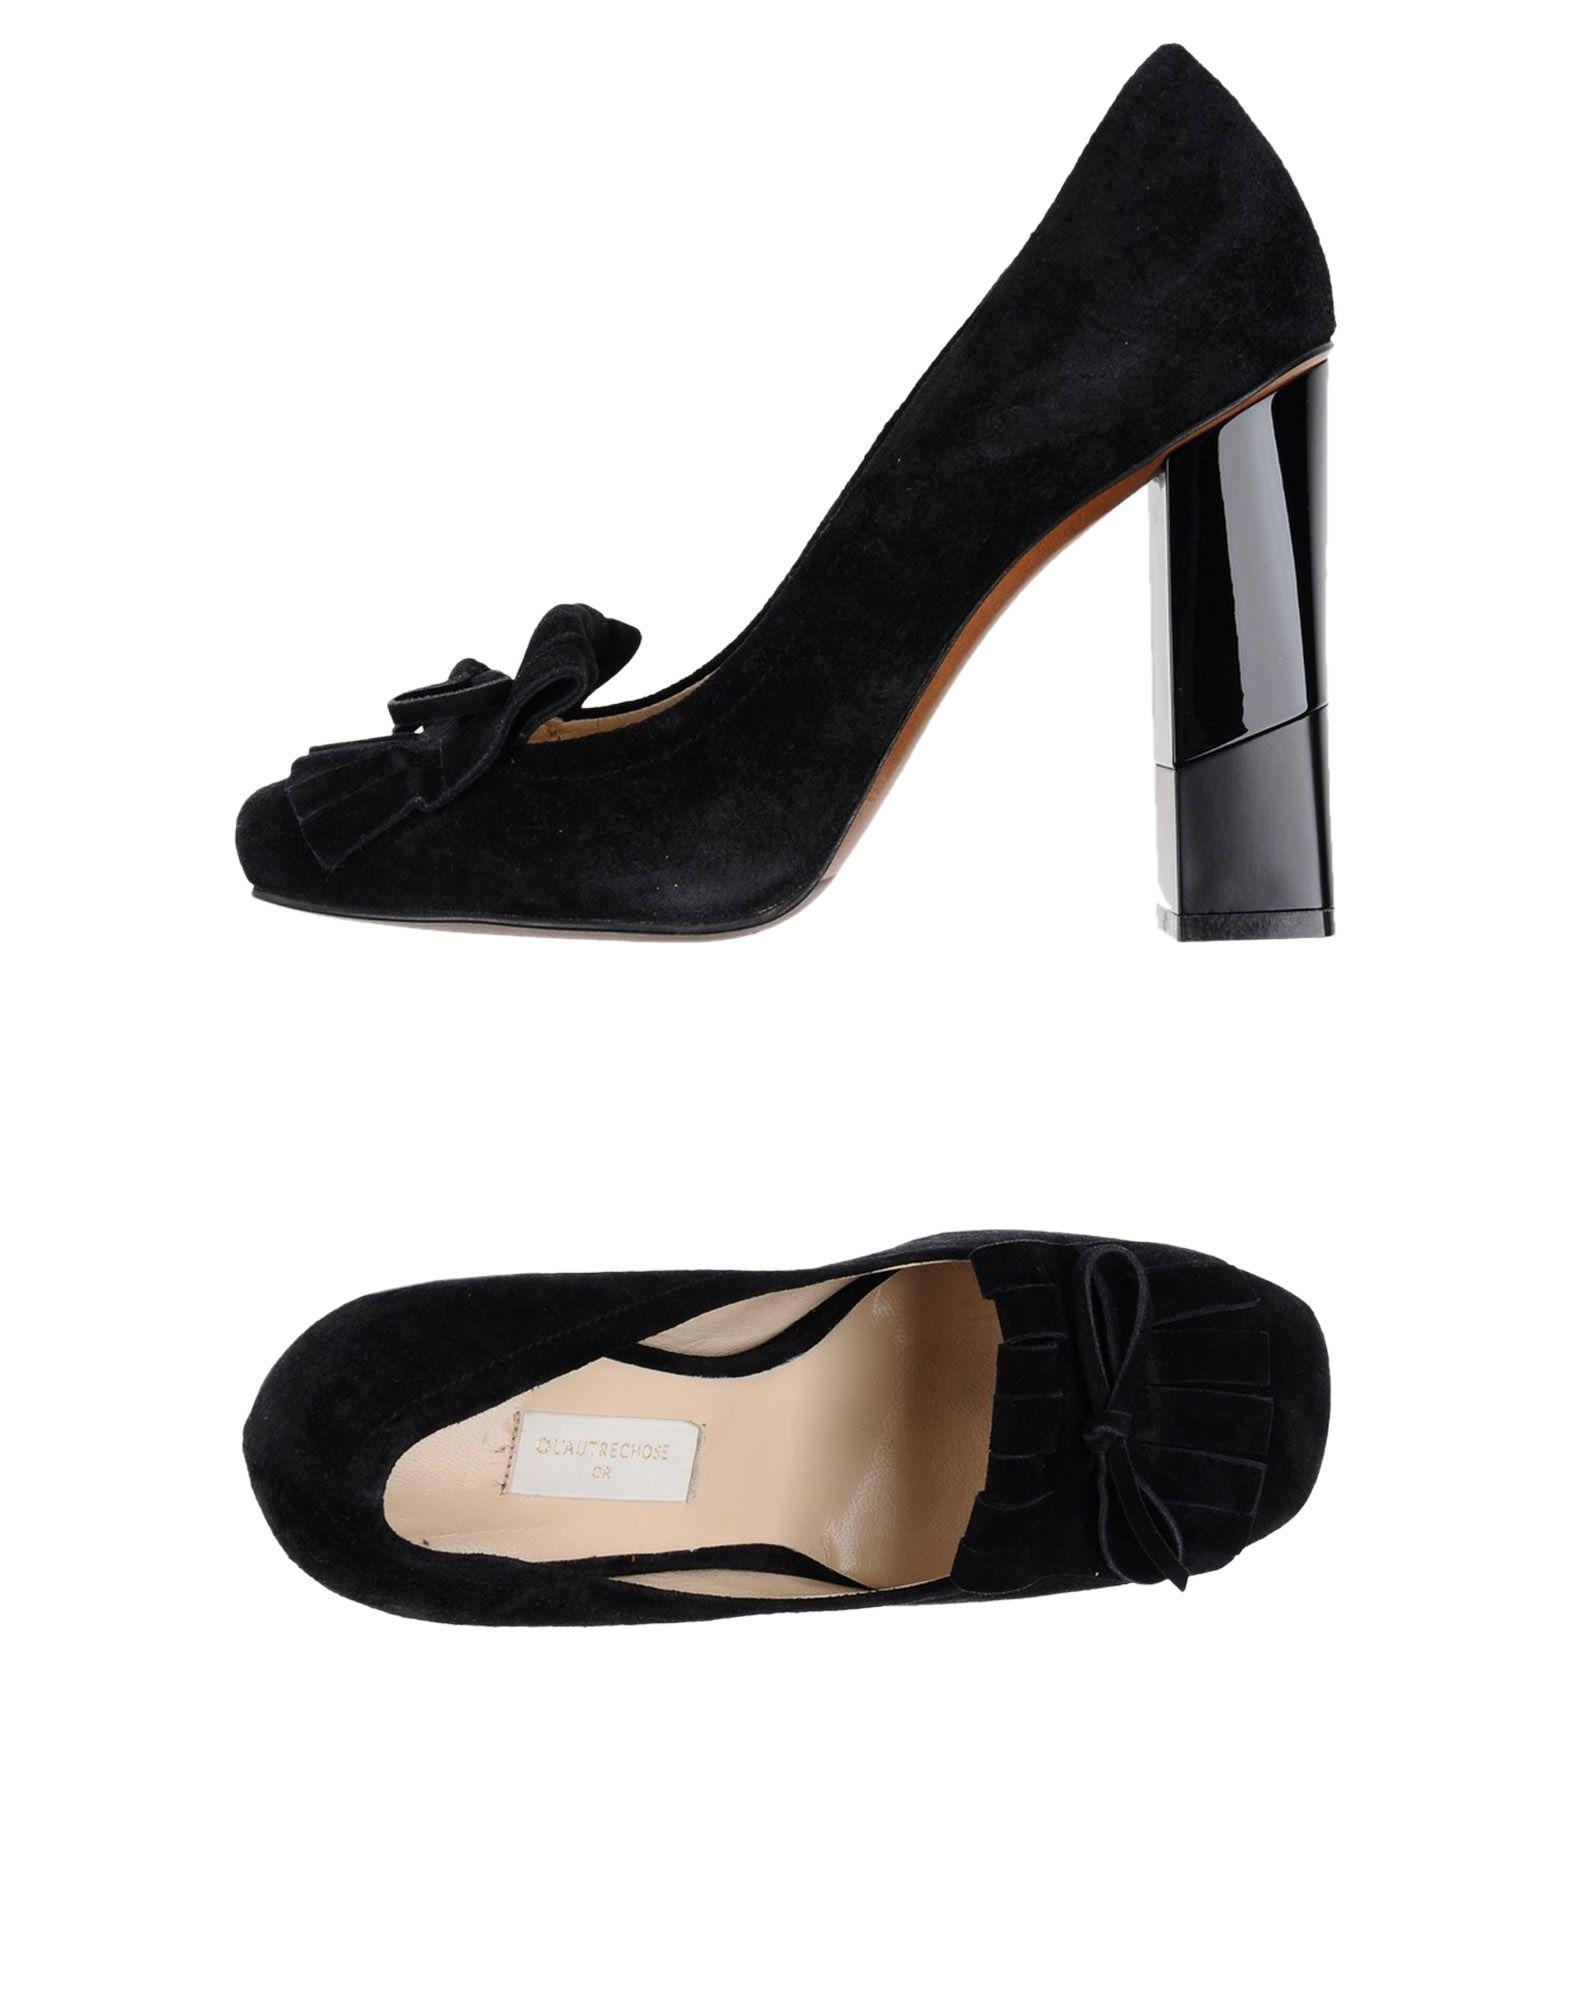 L' Autre Chose Mokassins Damen  11251242NTGut aussehende strapazierfähige Schuhe